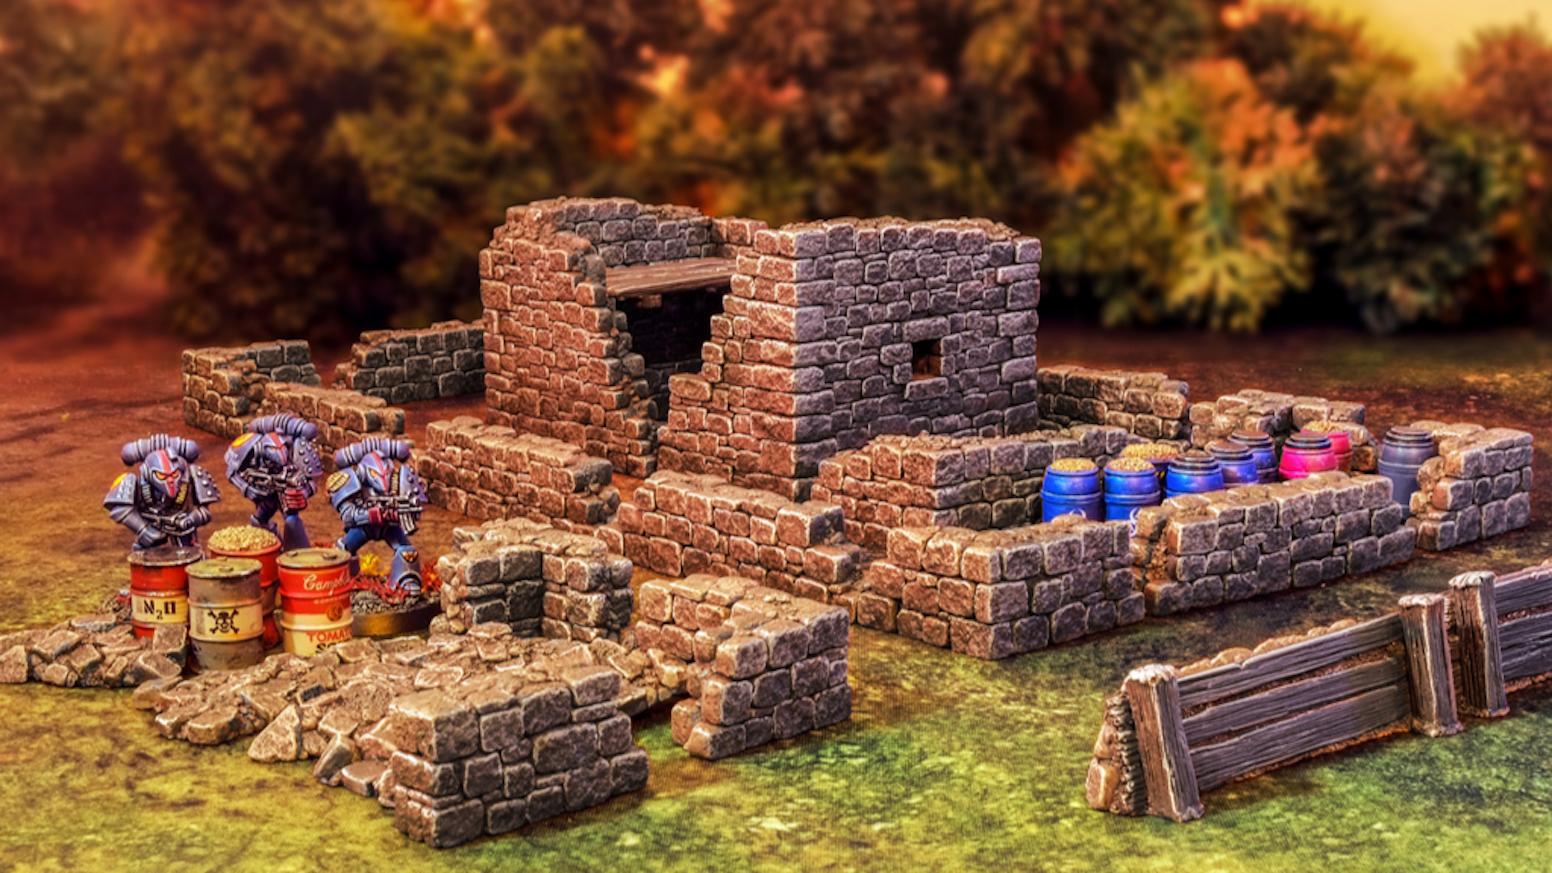 Battle at the Farm - 28mm wargaming terrain by Fogou Models